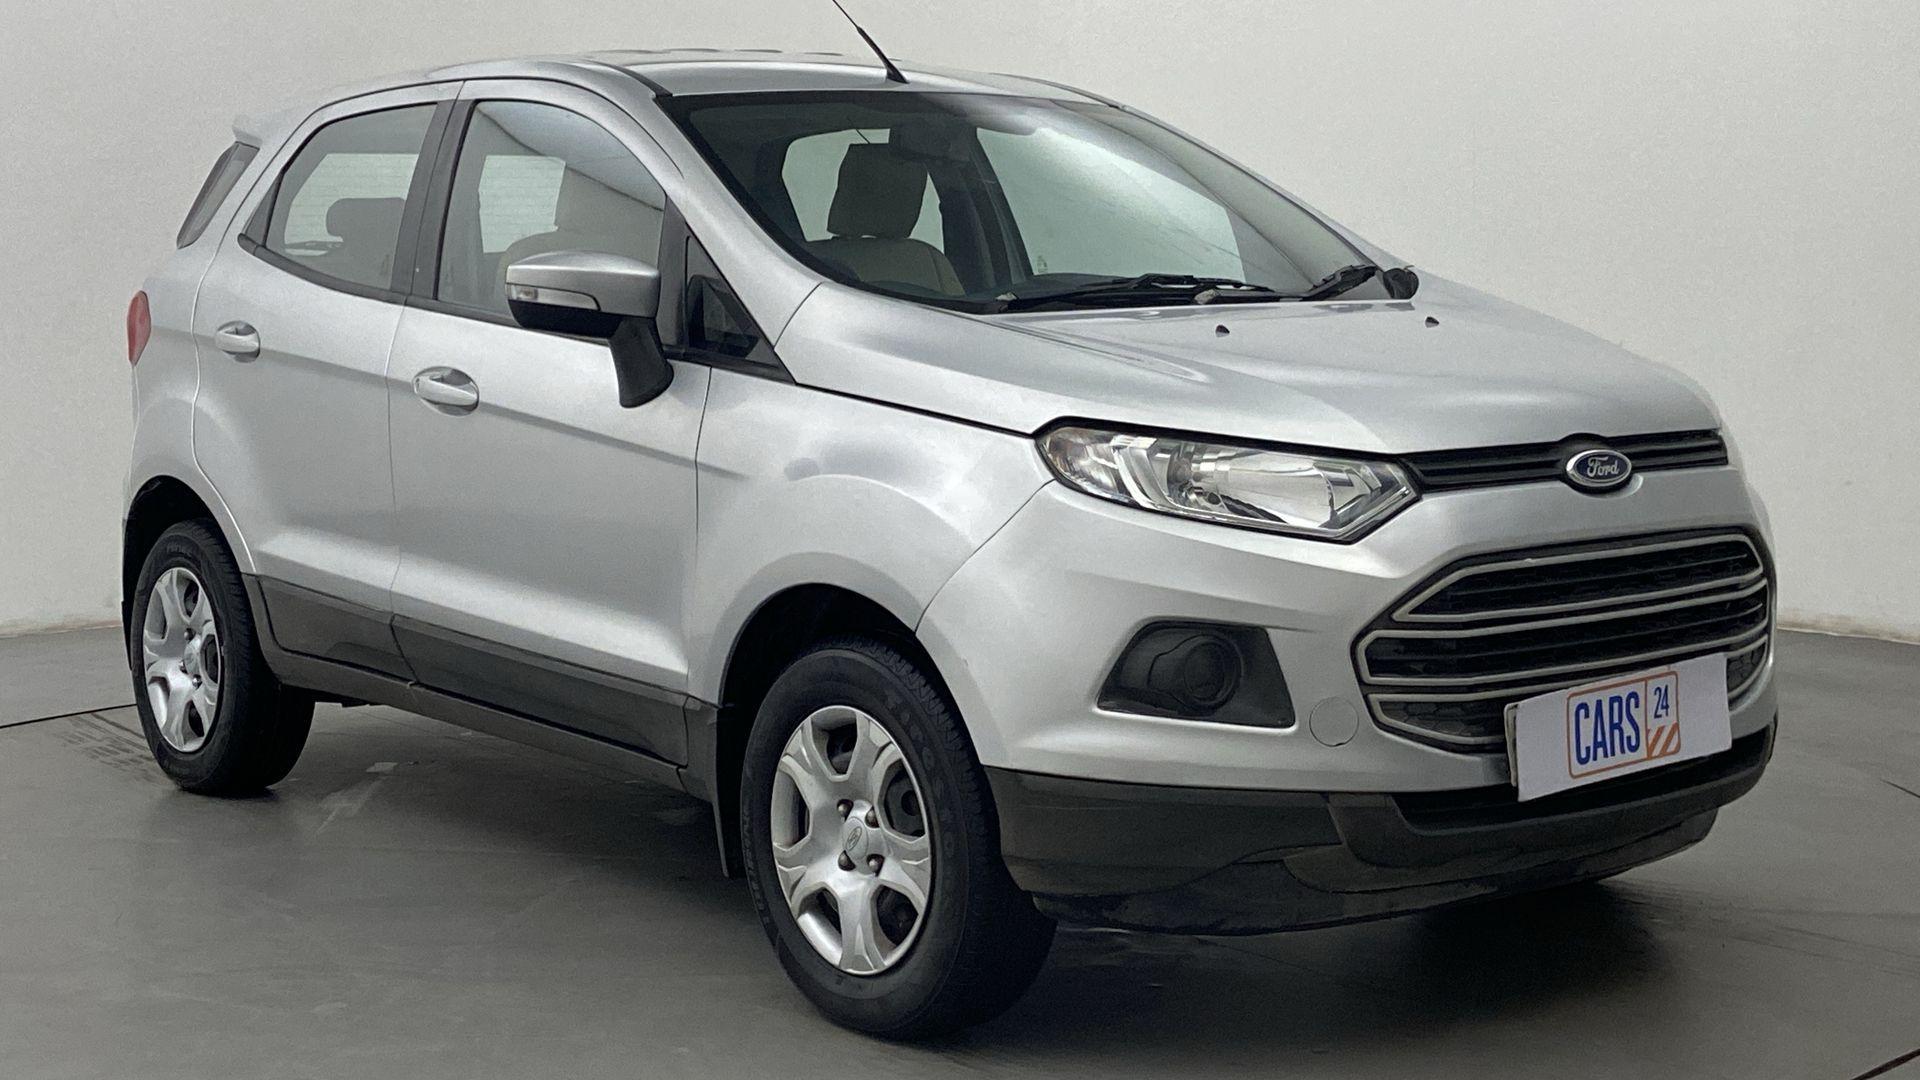 2015 Ford Ecosport 1.5 TREND TDCI